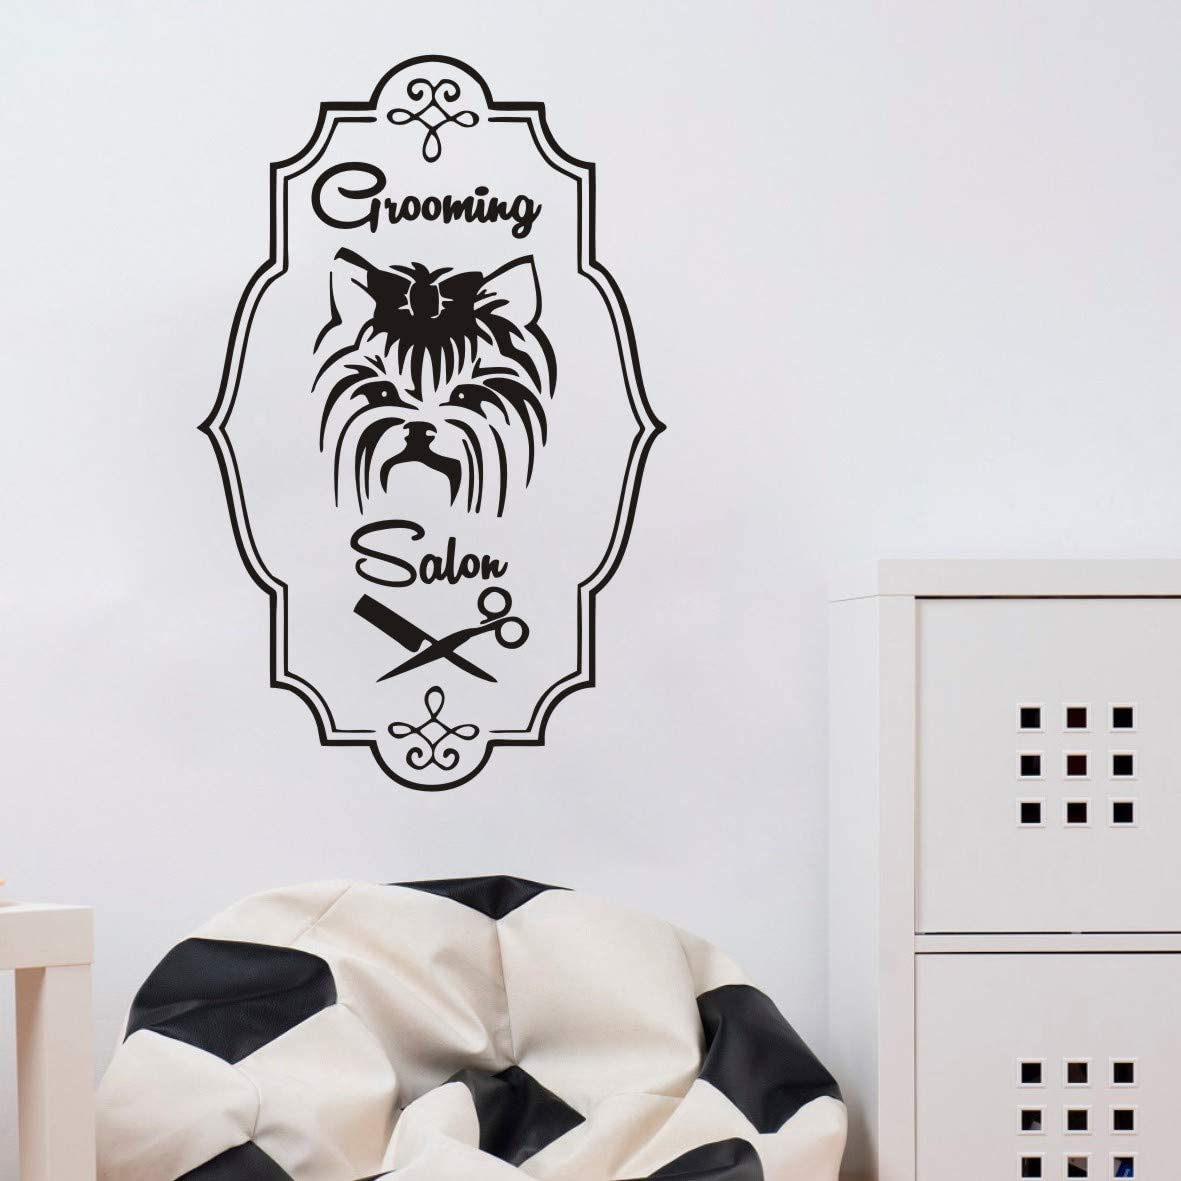 YOYOYU ART HOME DECOR Pet Shop Wall Decal Dog Grooming Salon Window Door Sticker Pets Beauty Salon Decoration Wall Vinyl Pet Grooming Logo Decal AY910 (Black, 57x36cm)